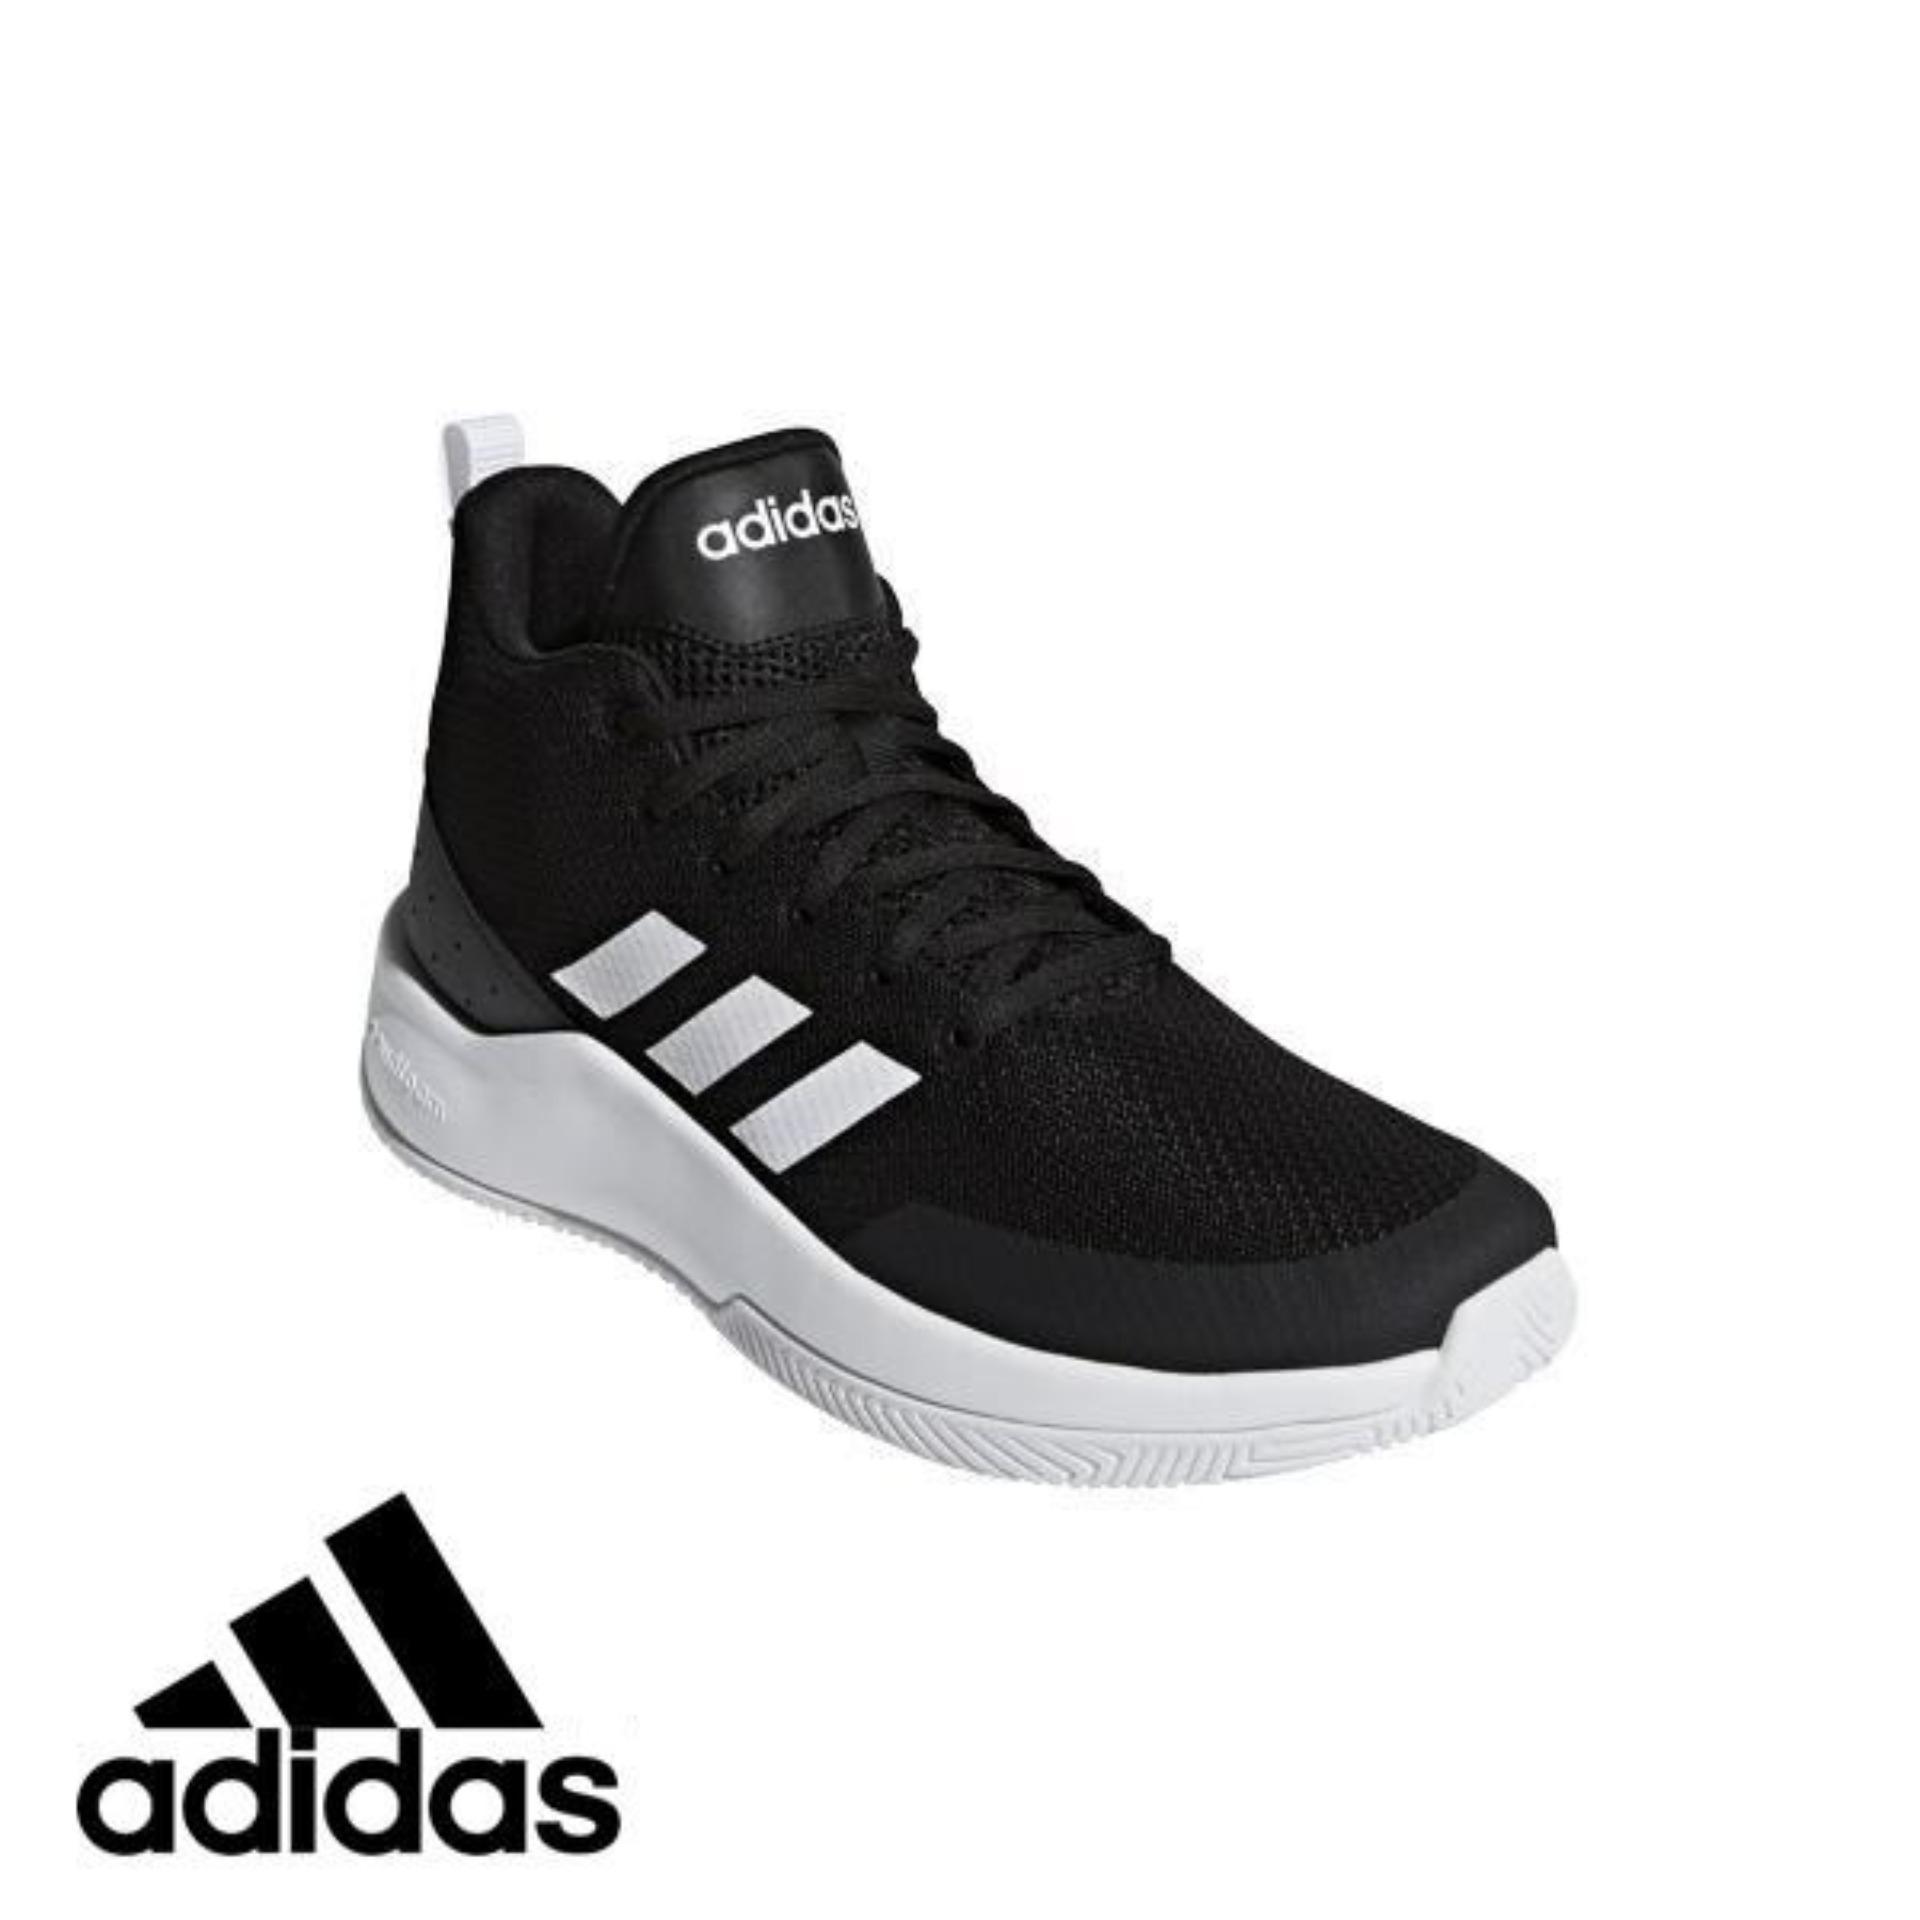 adidas t rex shoes price